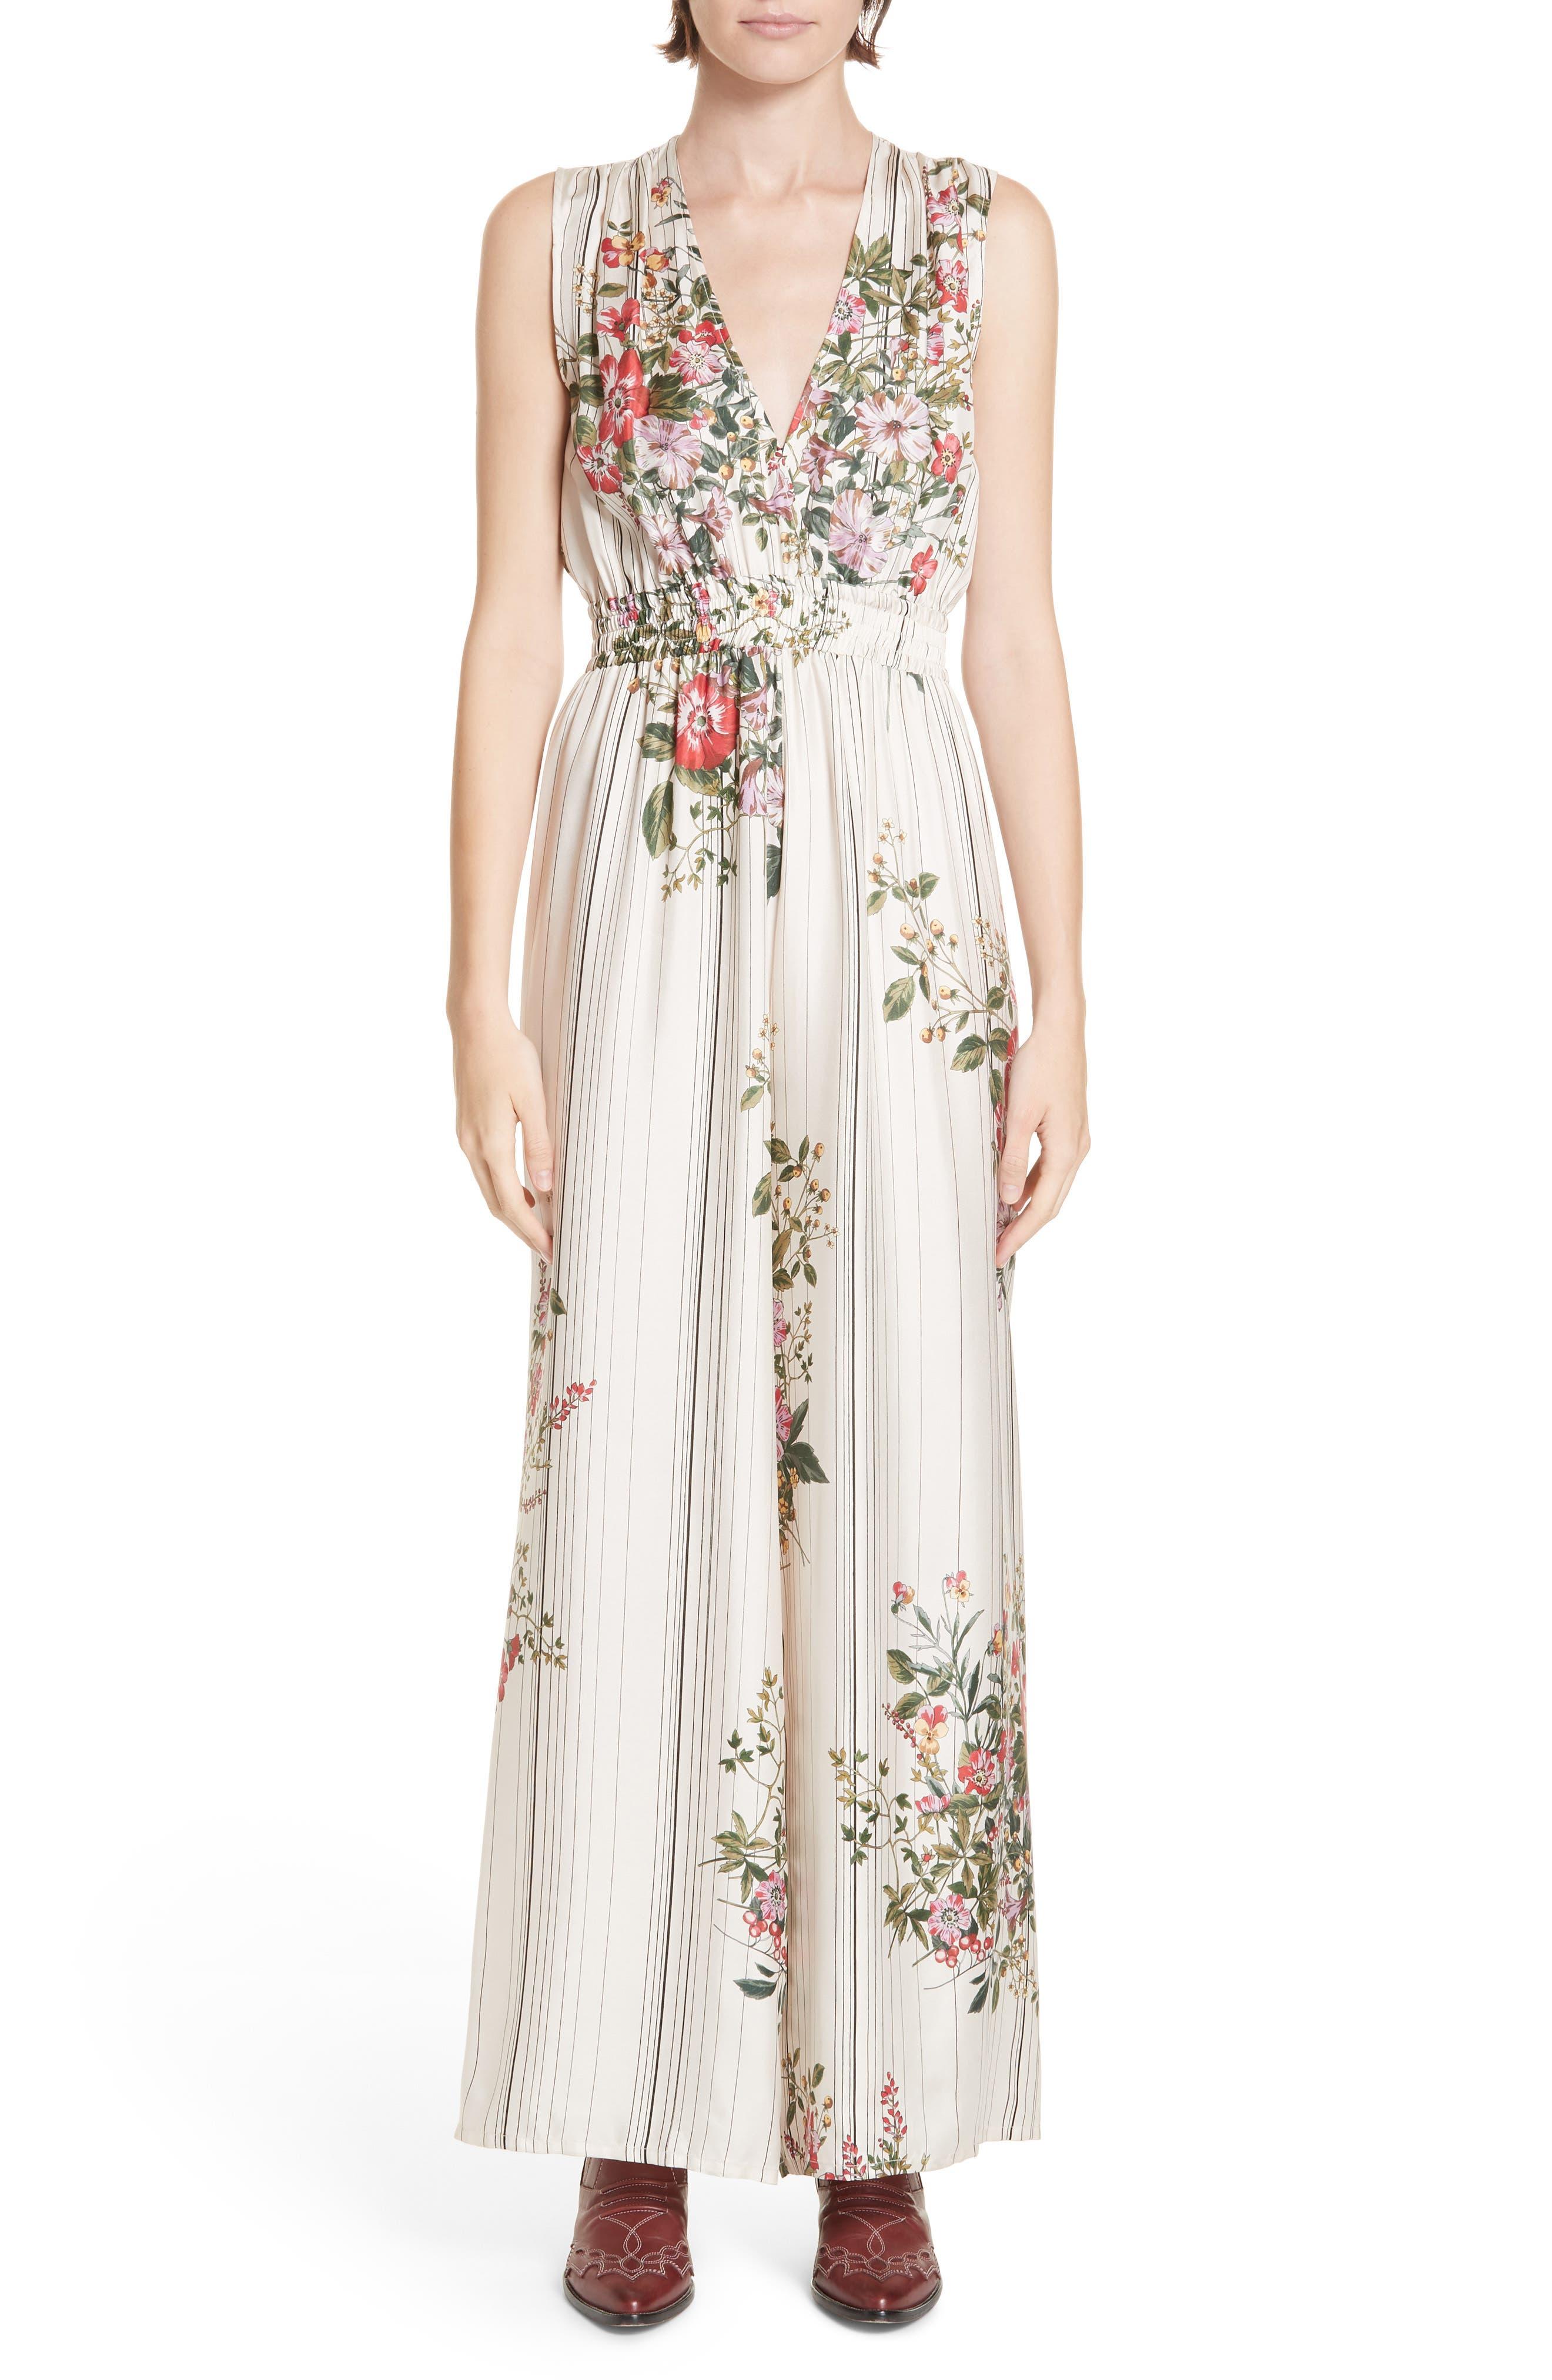 ROSEANNA Frisco Floral & Stripe Silk Jumpsuit in Multi Ivoire